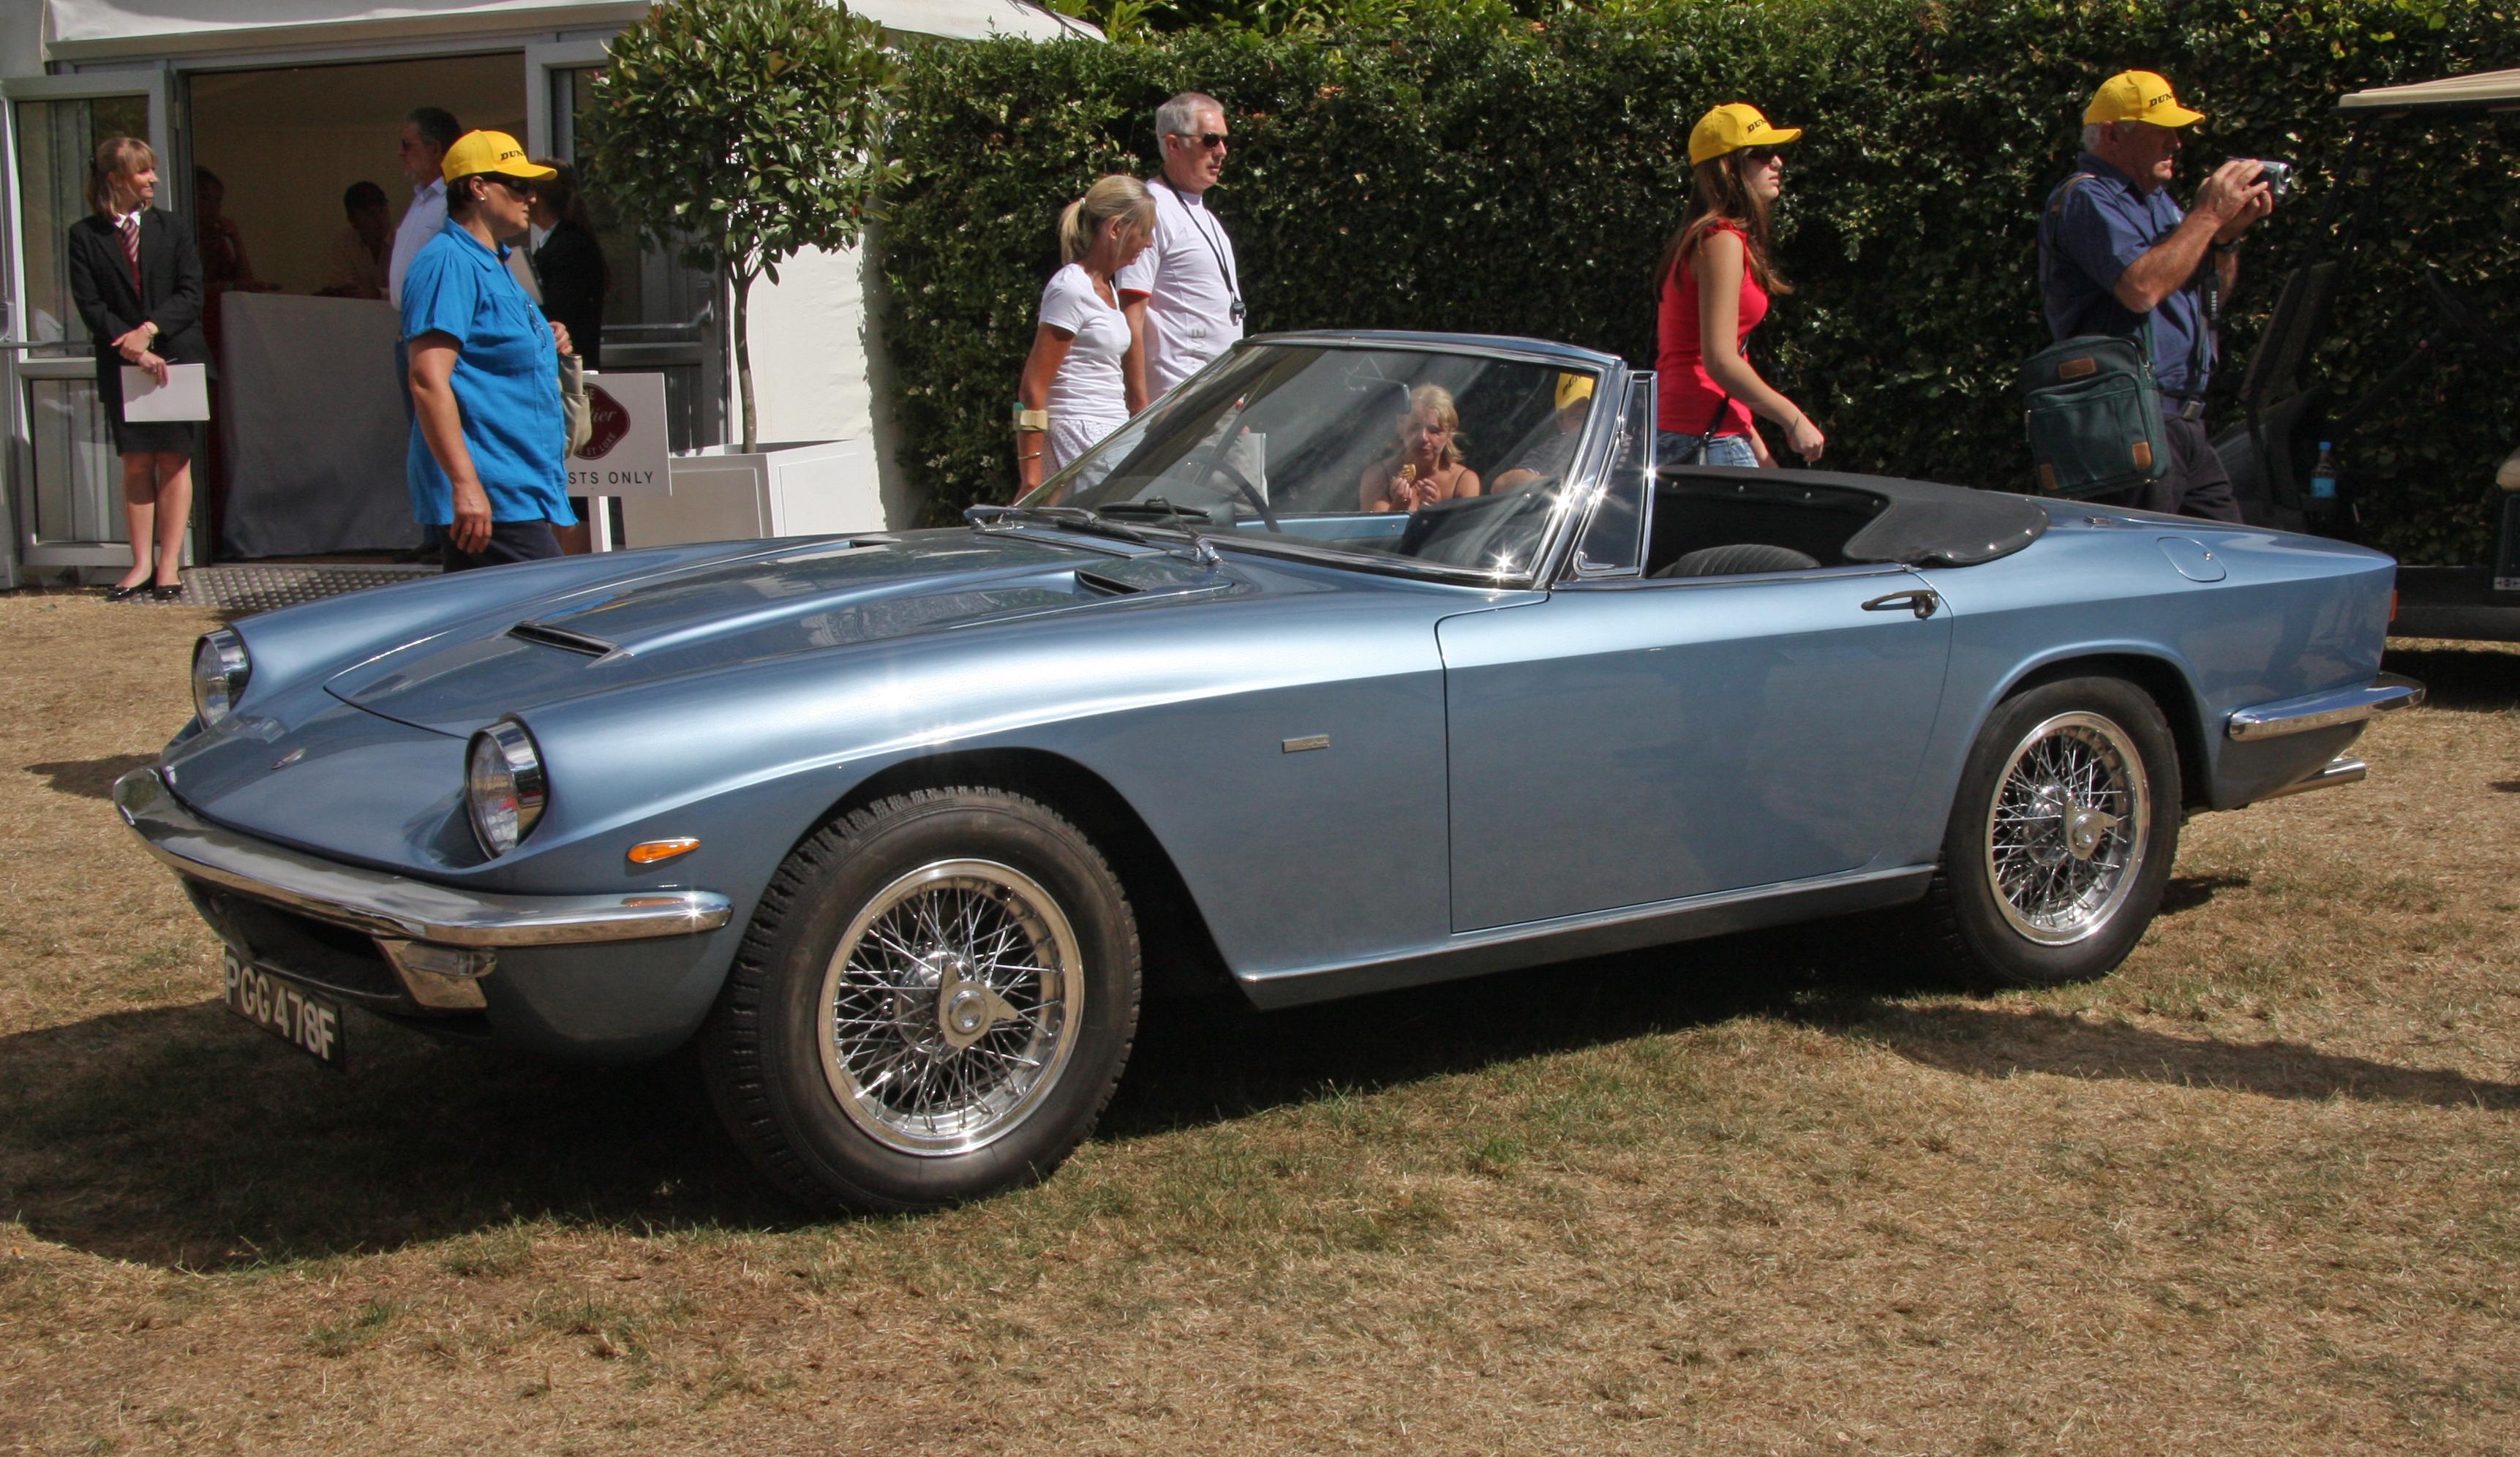 Datei:1967 Maserati Mistral Spyder.jpg – Wikipedia